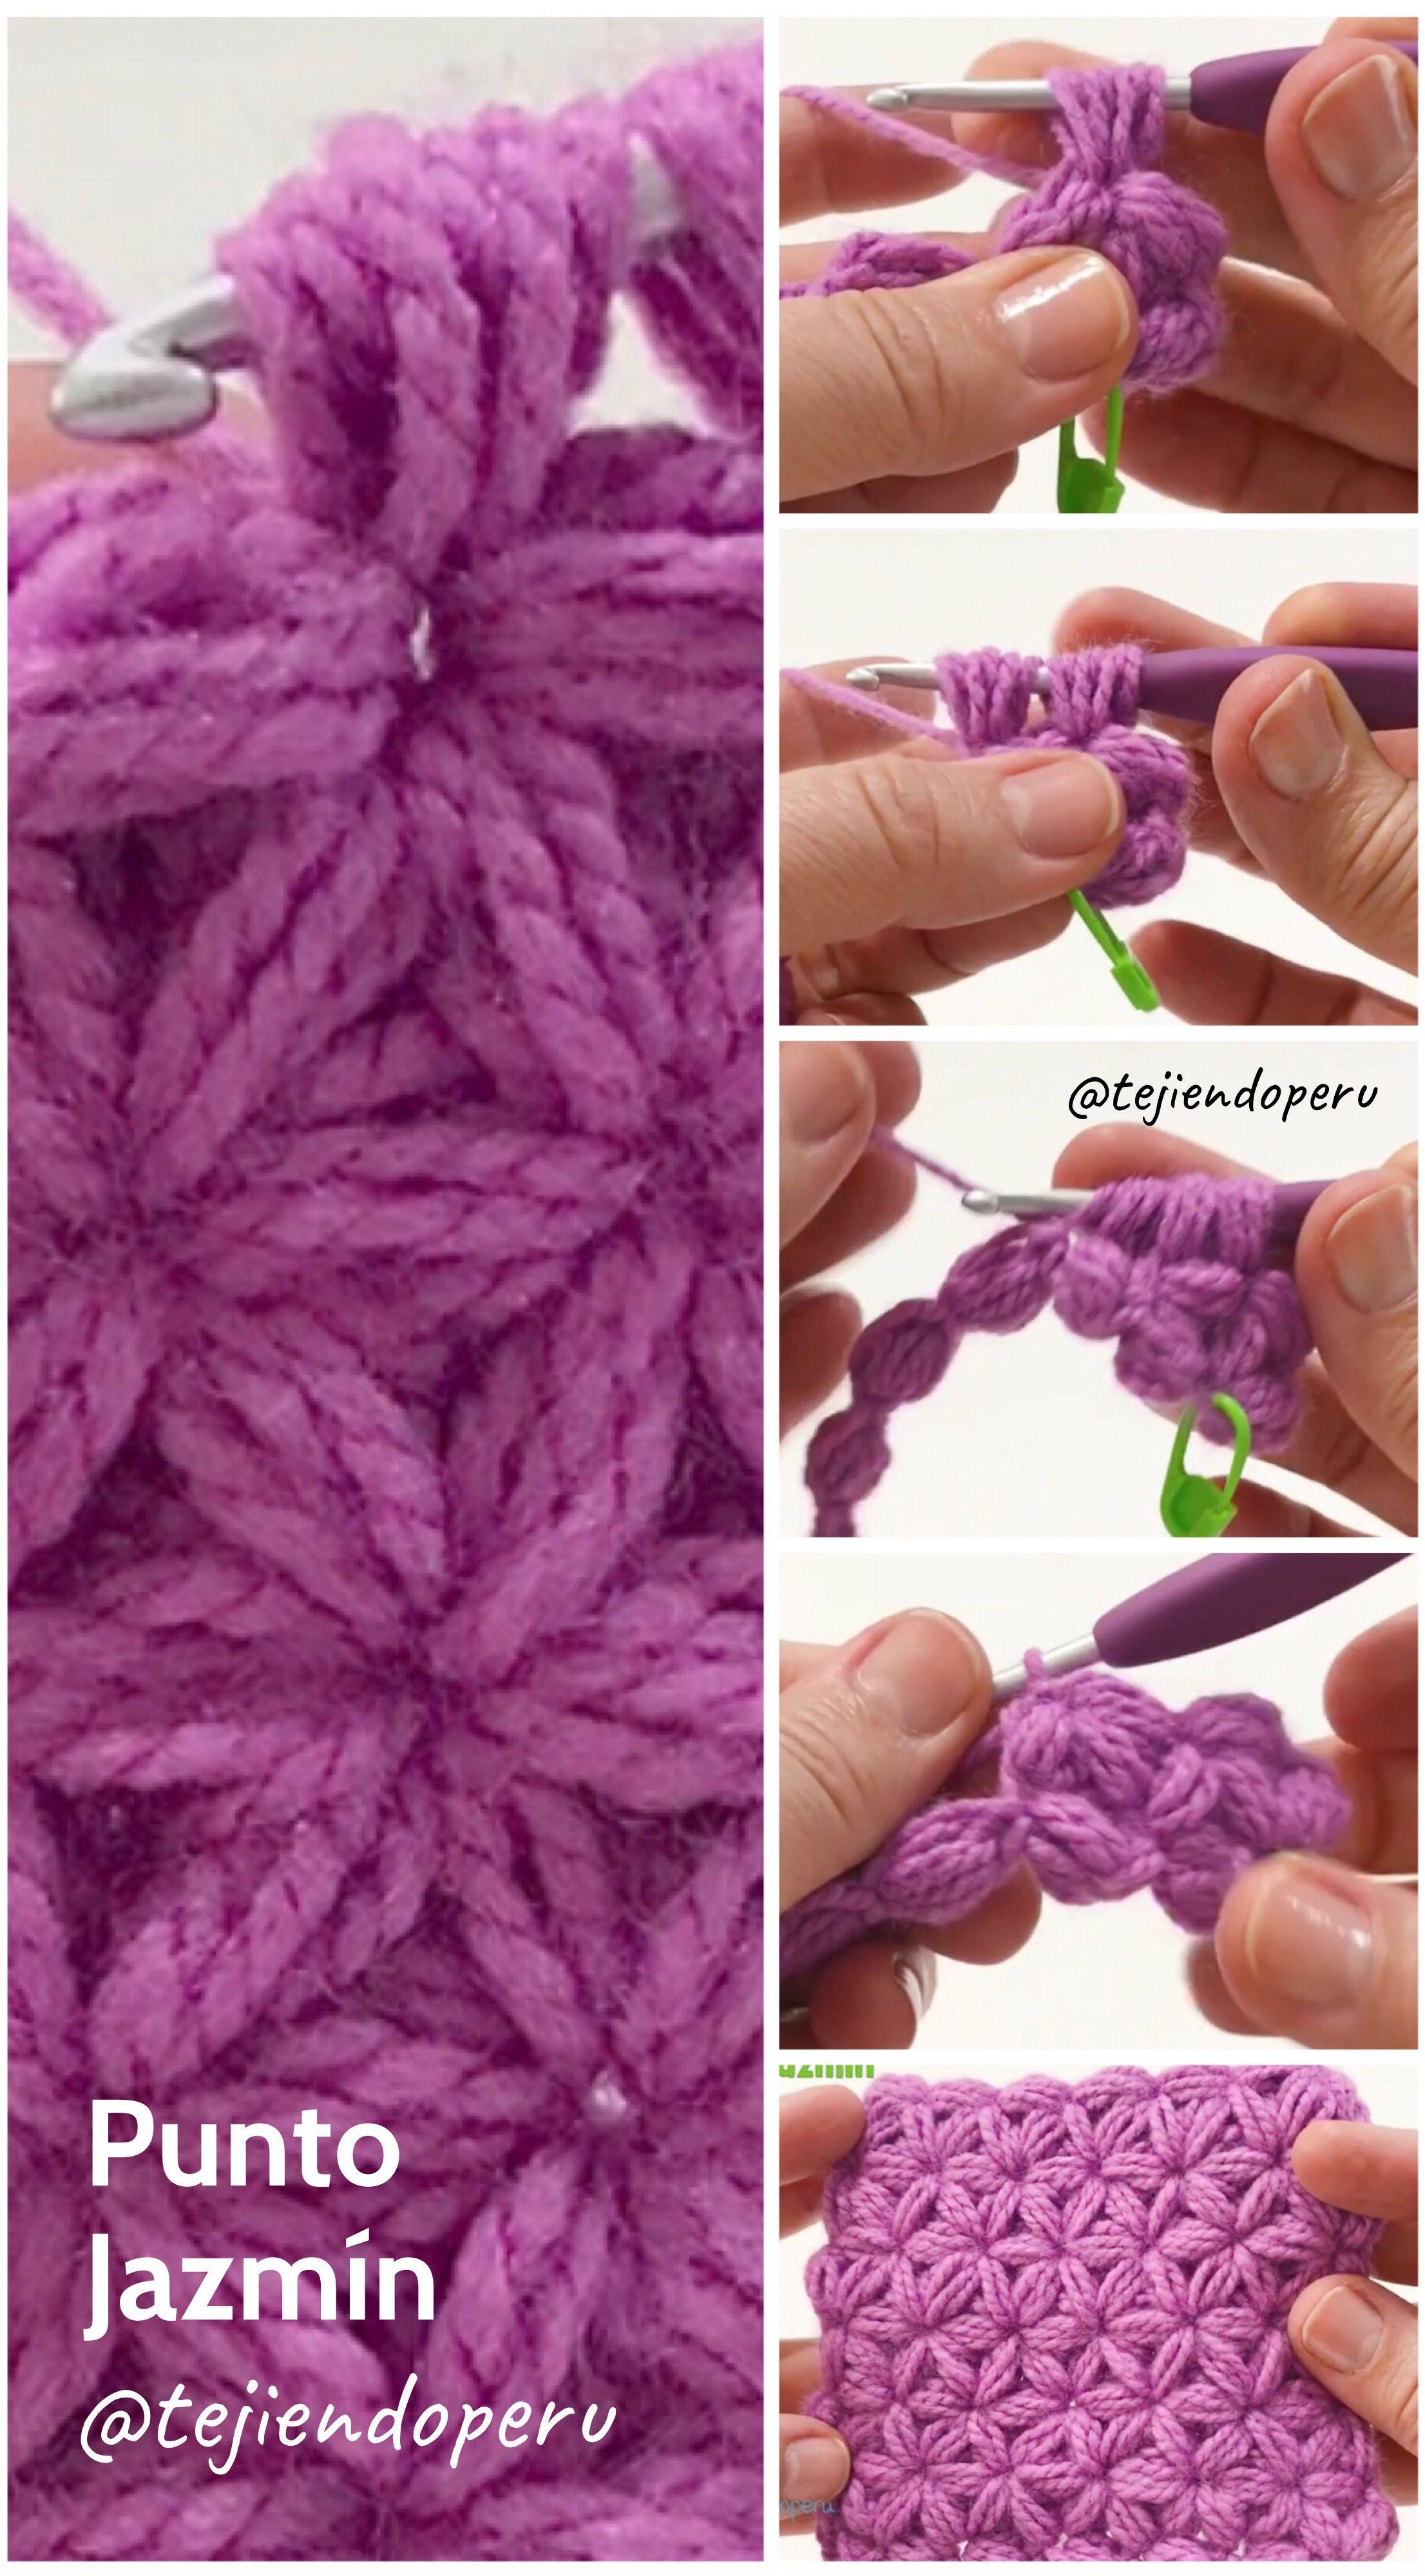 Punto Jazmín O Estrella Doble Tejido A Crochet Video Tutorial Del Paso A Paso Monederos Tejidos A Crochet Punto Jazmin Tejidos A Crochet